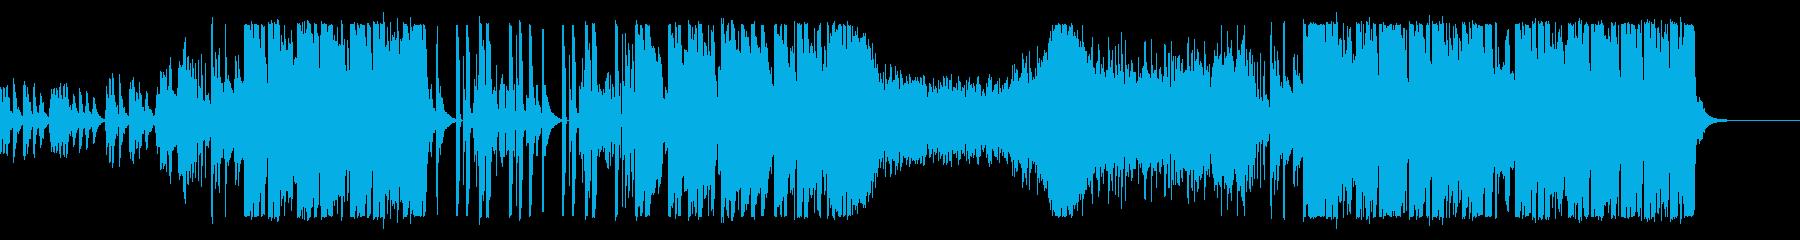 K-POPアイドル風ダンサブルなポップスの再生済みの波形